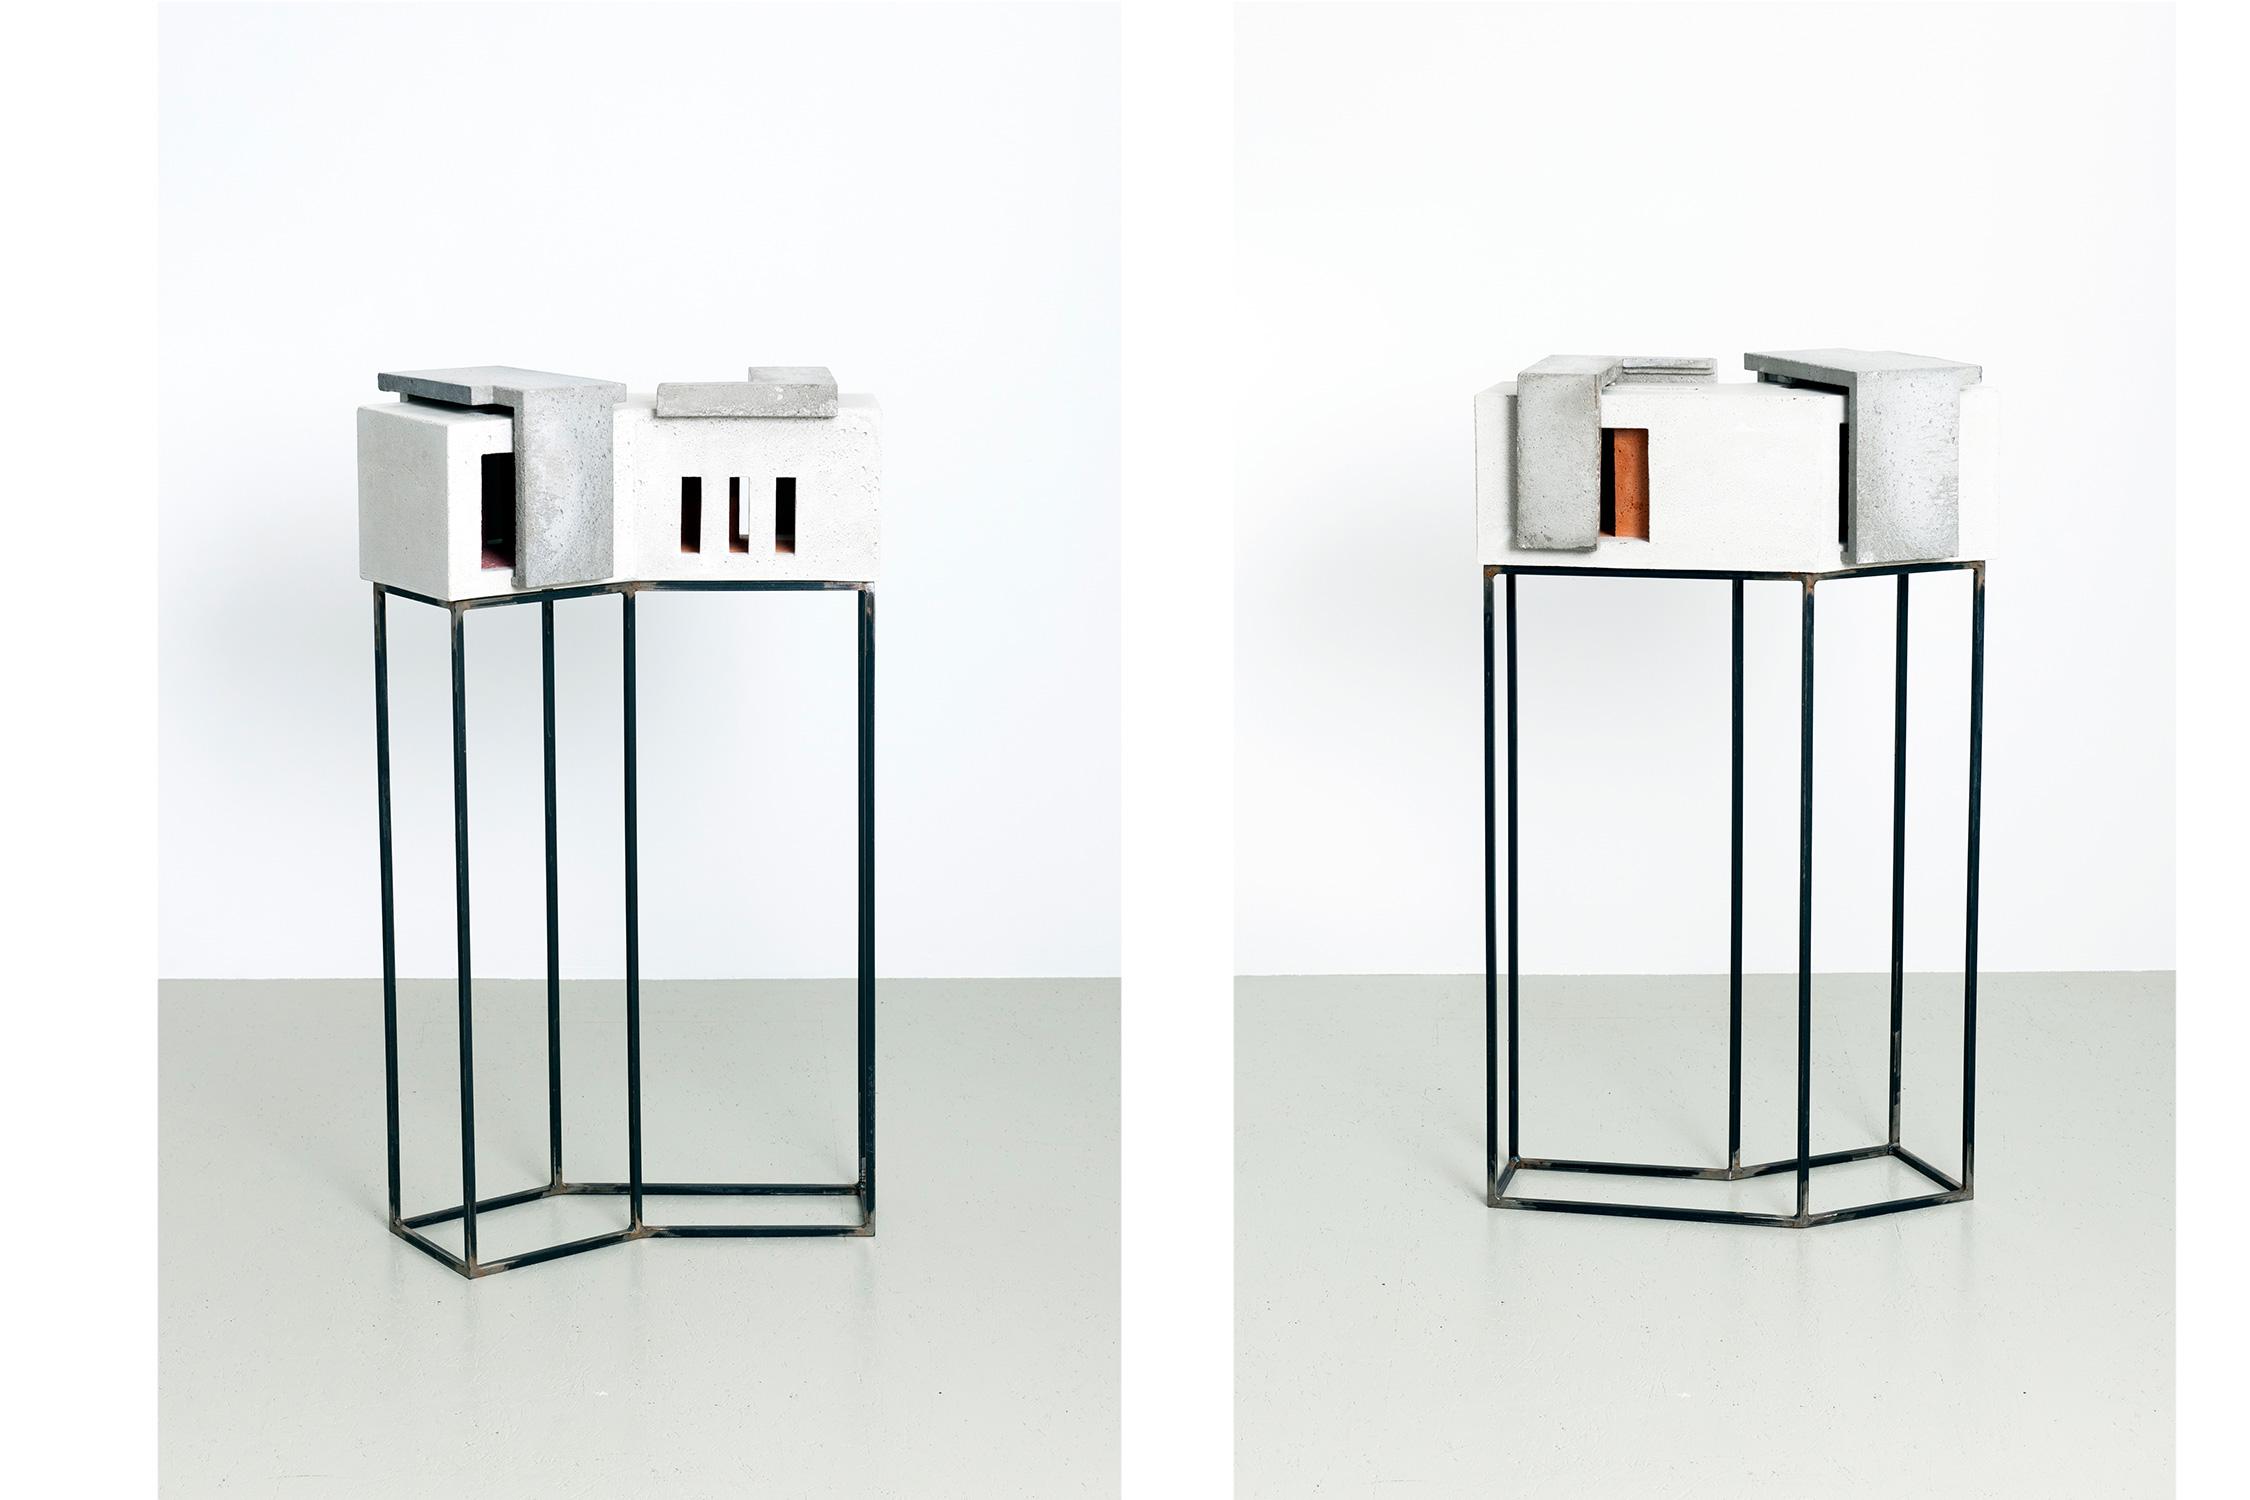 Espace IV | 2016 | Beton,Metall | 68 x 28 x 107 cm